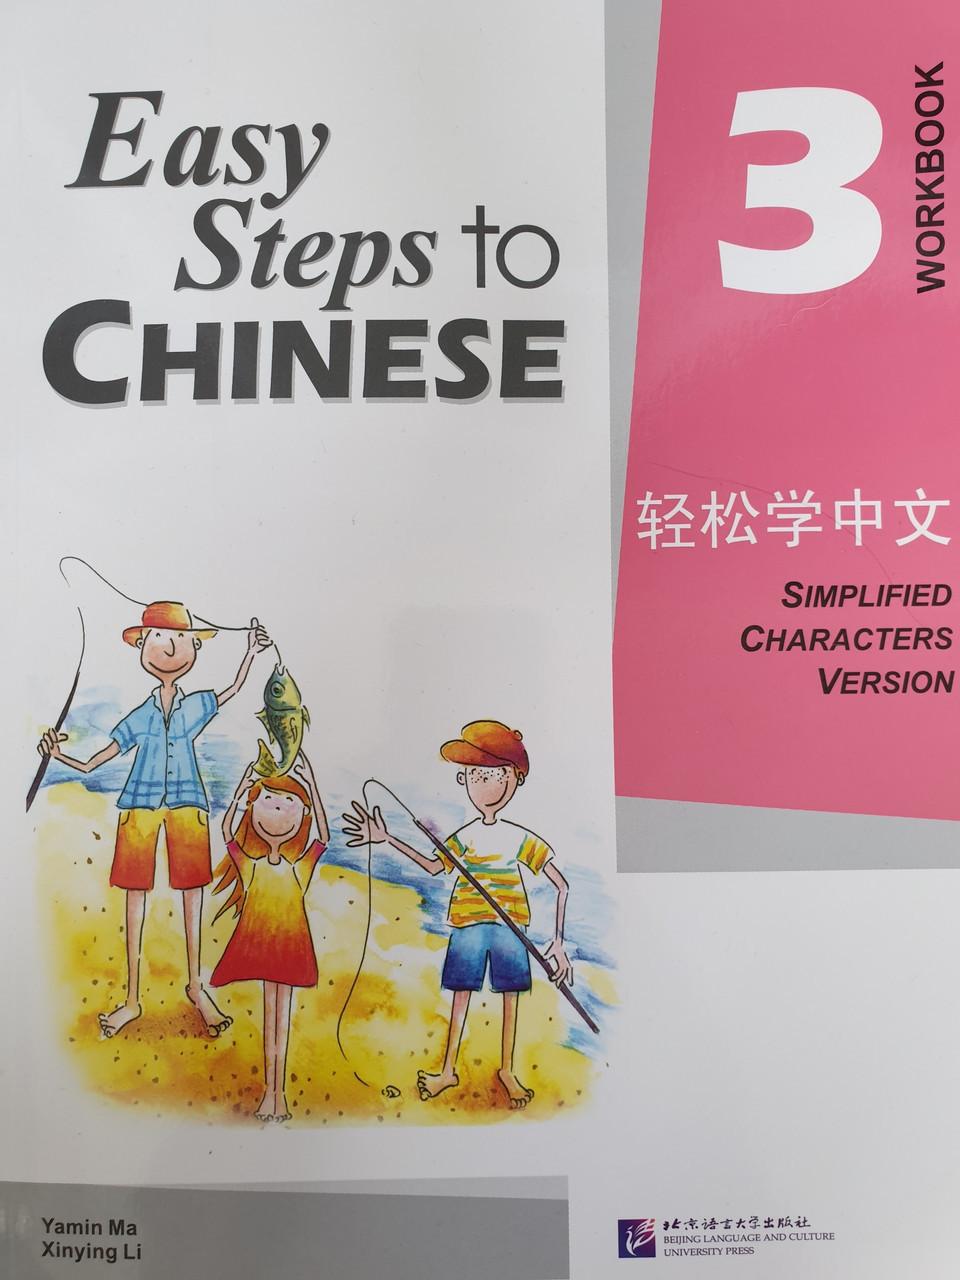 Easy Steps to Chinese. Том 3. Рабочая тетрадь (английское издание)